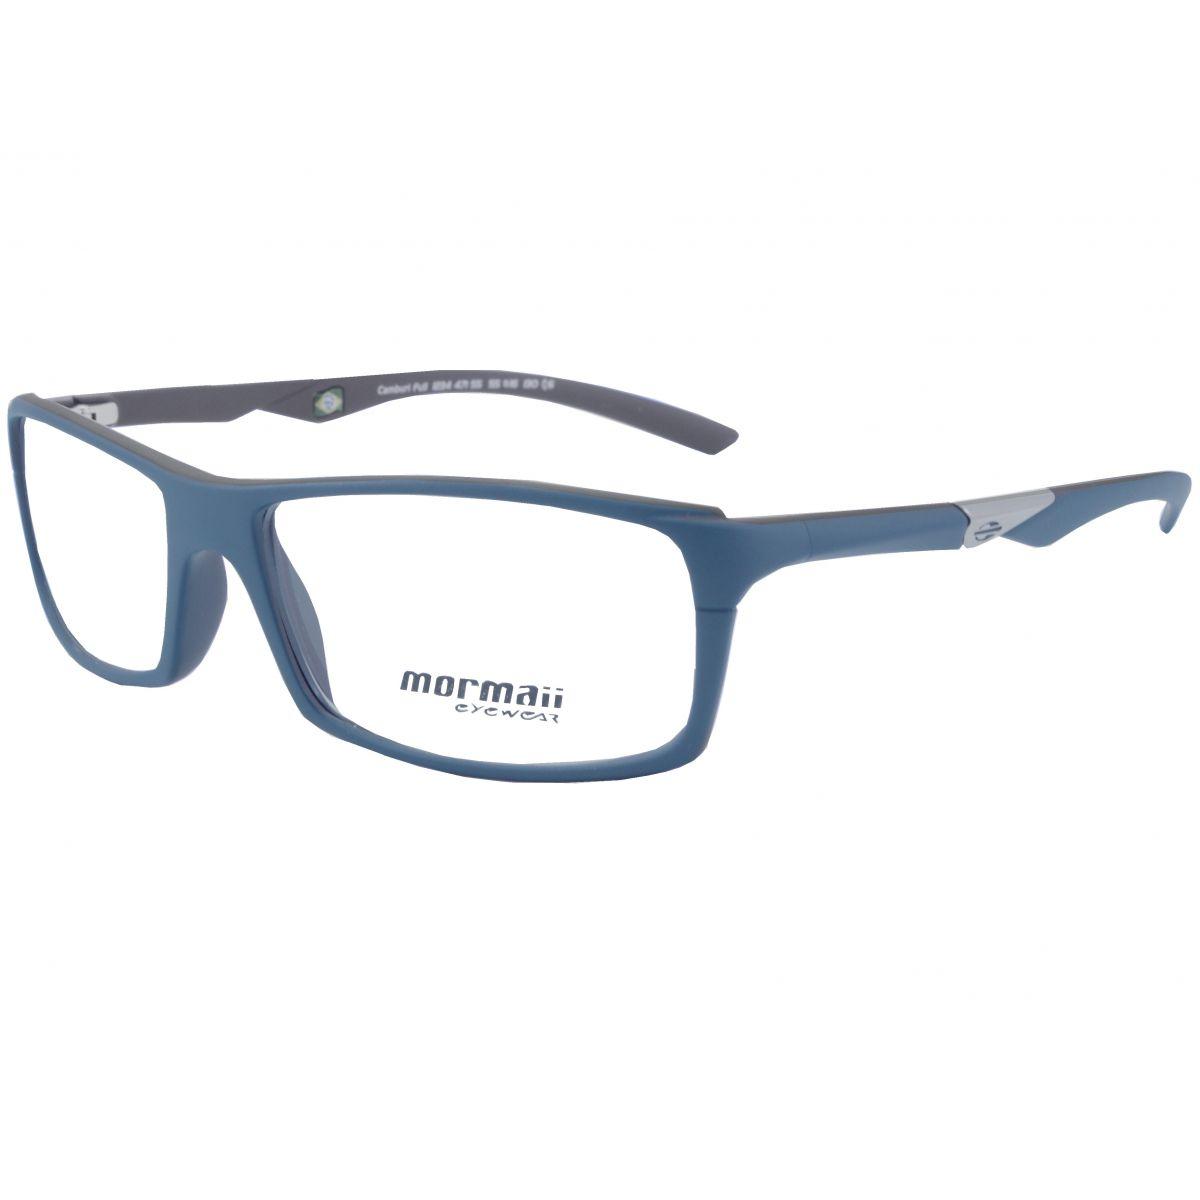 6d4607934b769 Óculos De Grau Masculino Mormaii Camburi Full M1234 471 Tam ...